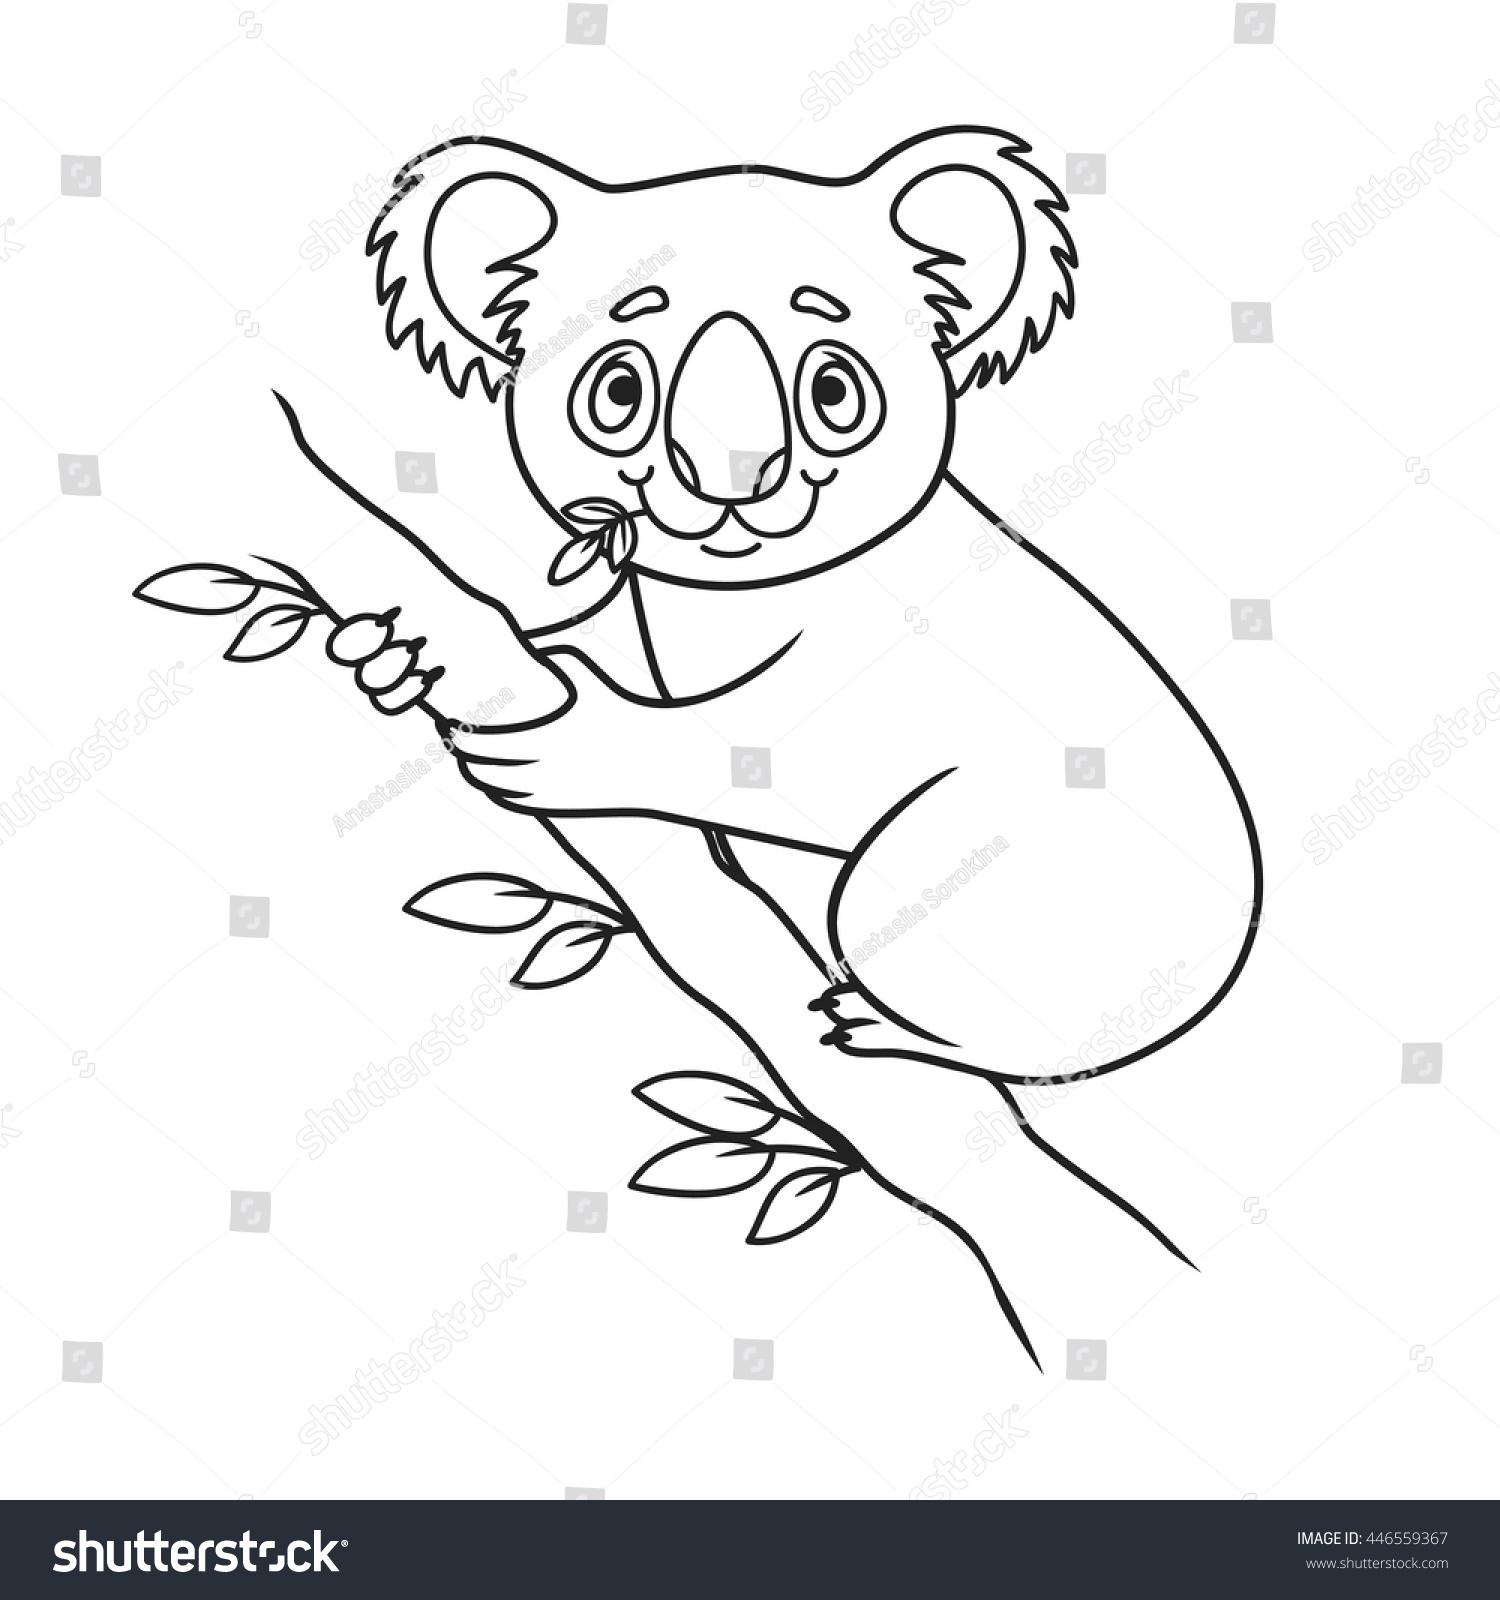 Cartoon Koala Coloring Book Vector Illustration Of Cute Animal Doodle